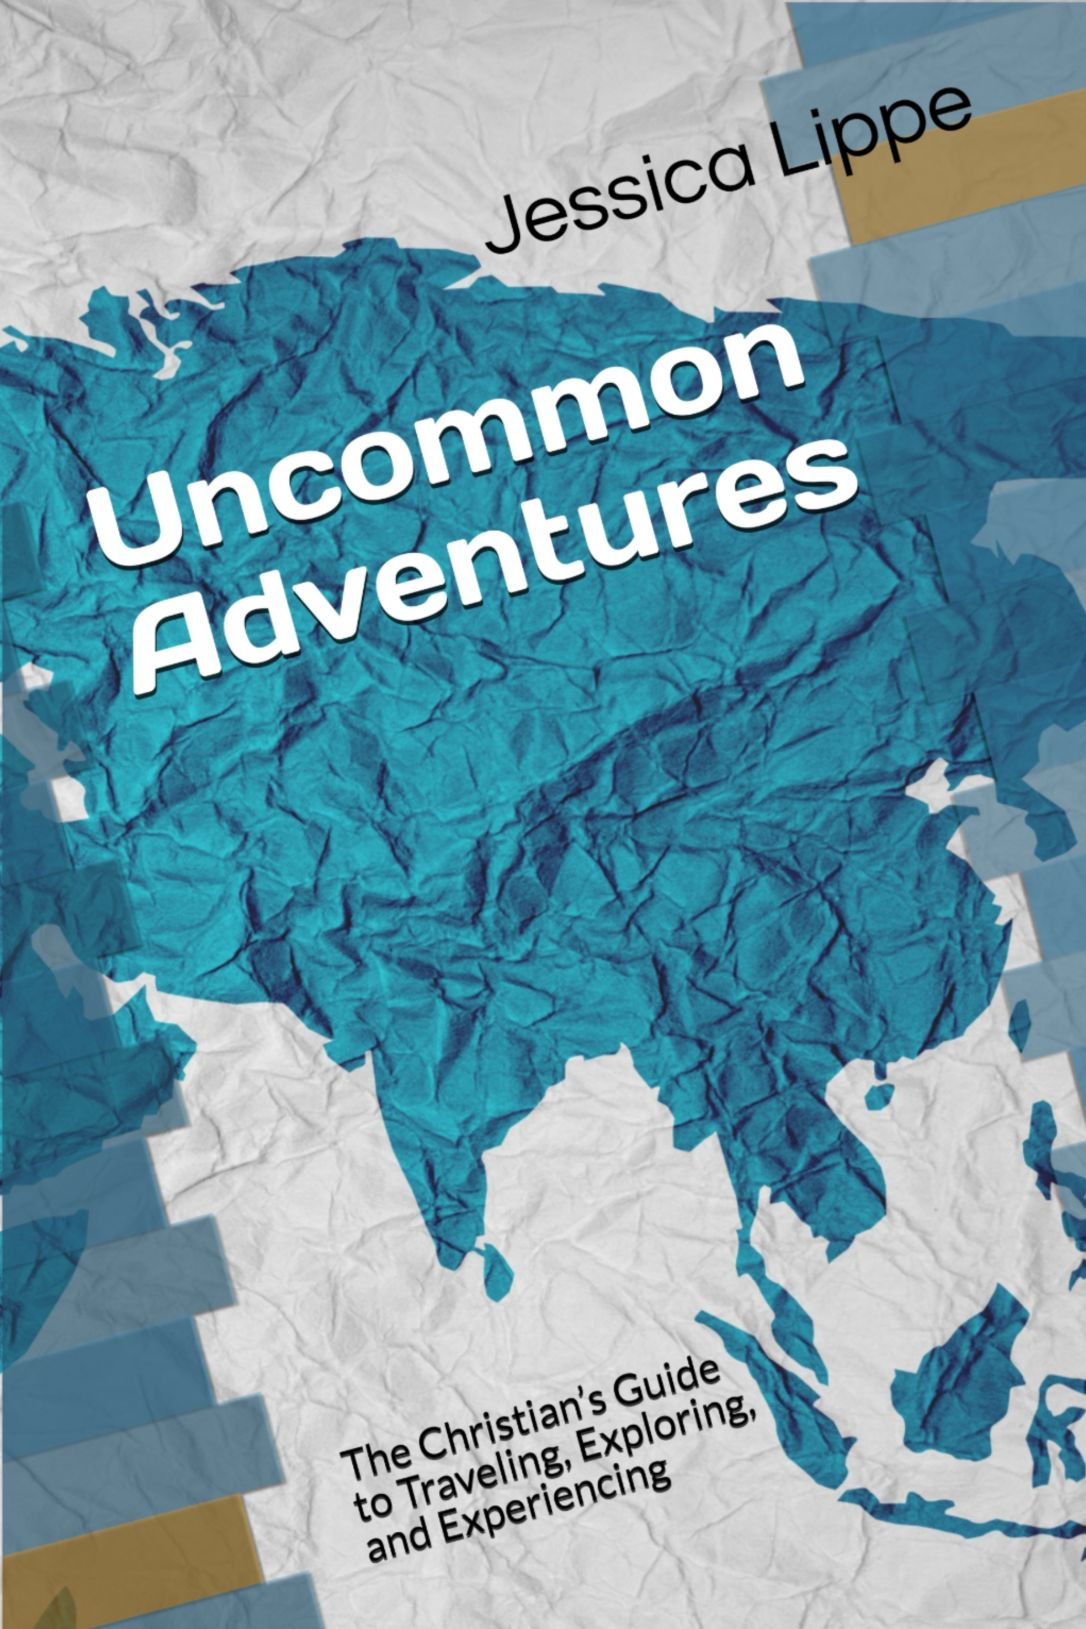 Uncommon Adventures by Jessica Lippe